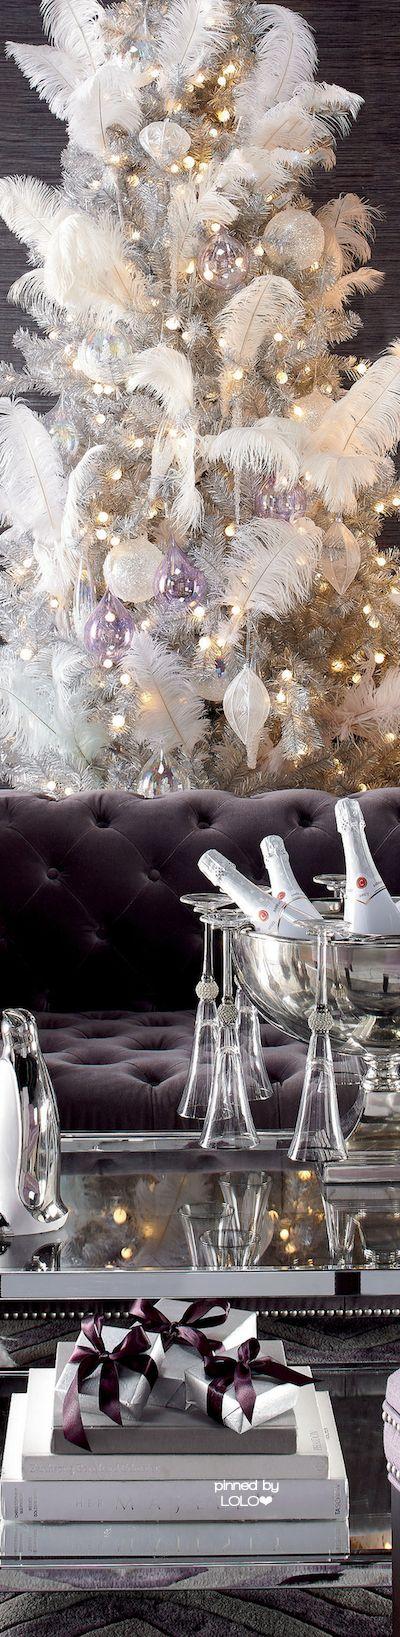 Stunning Room with Christmas Decor | LOLO❤︎